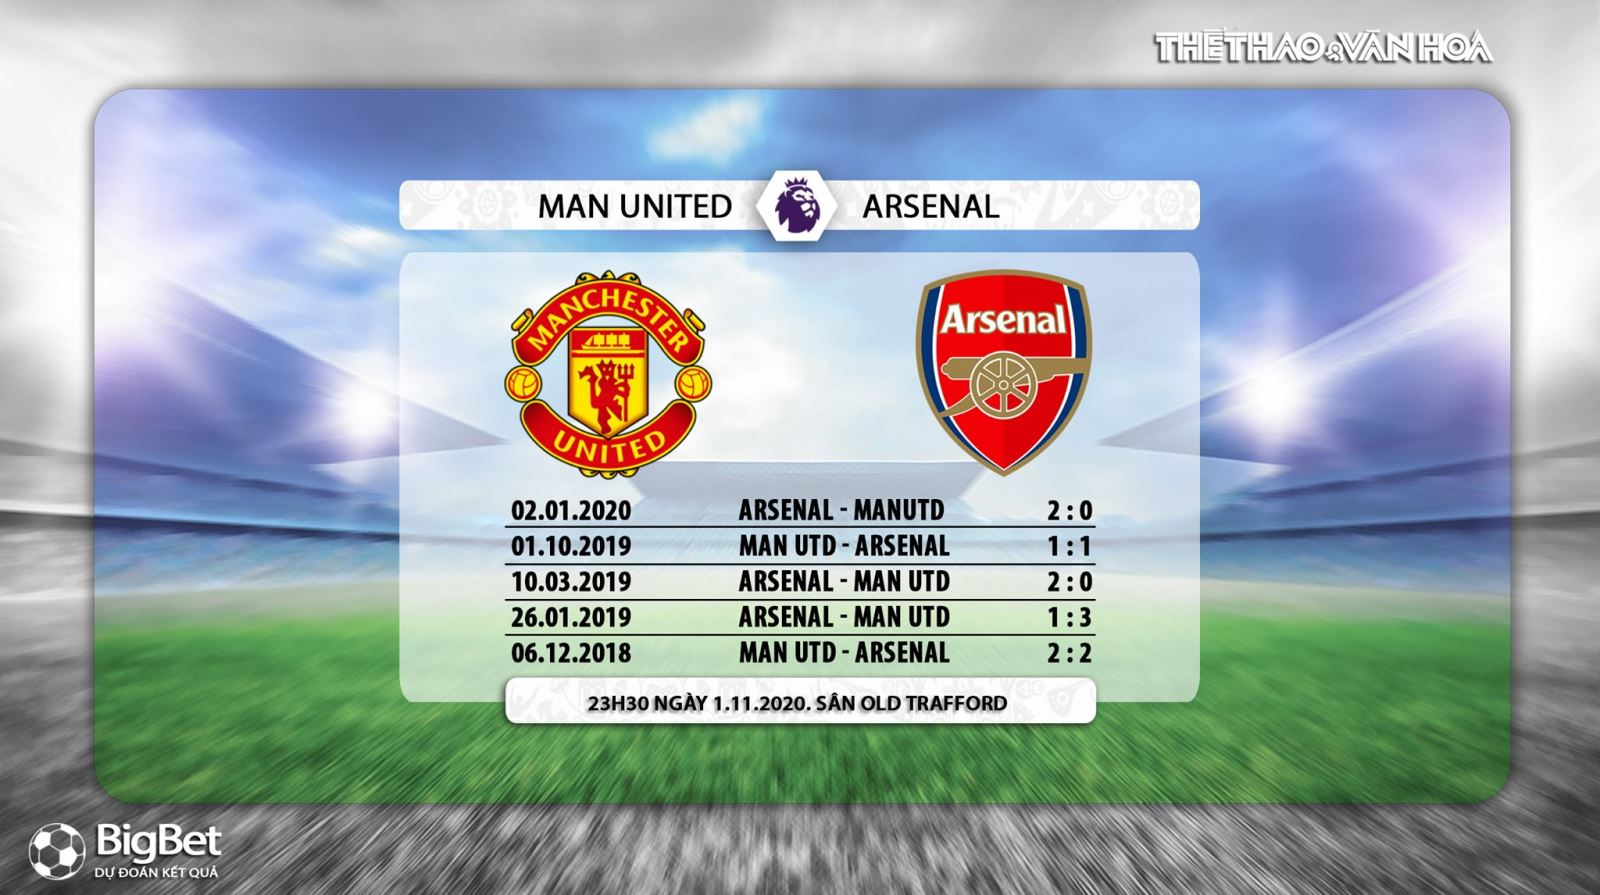 Truc tiep bong da. K+PM. MU vs Arsenal. Link xem trực tiếp MU vs Arsenal. Xem K+